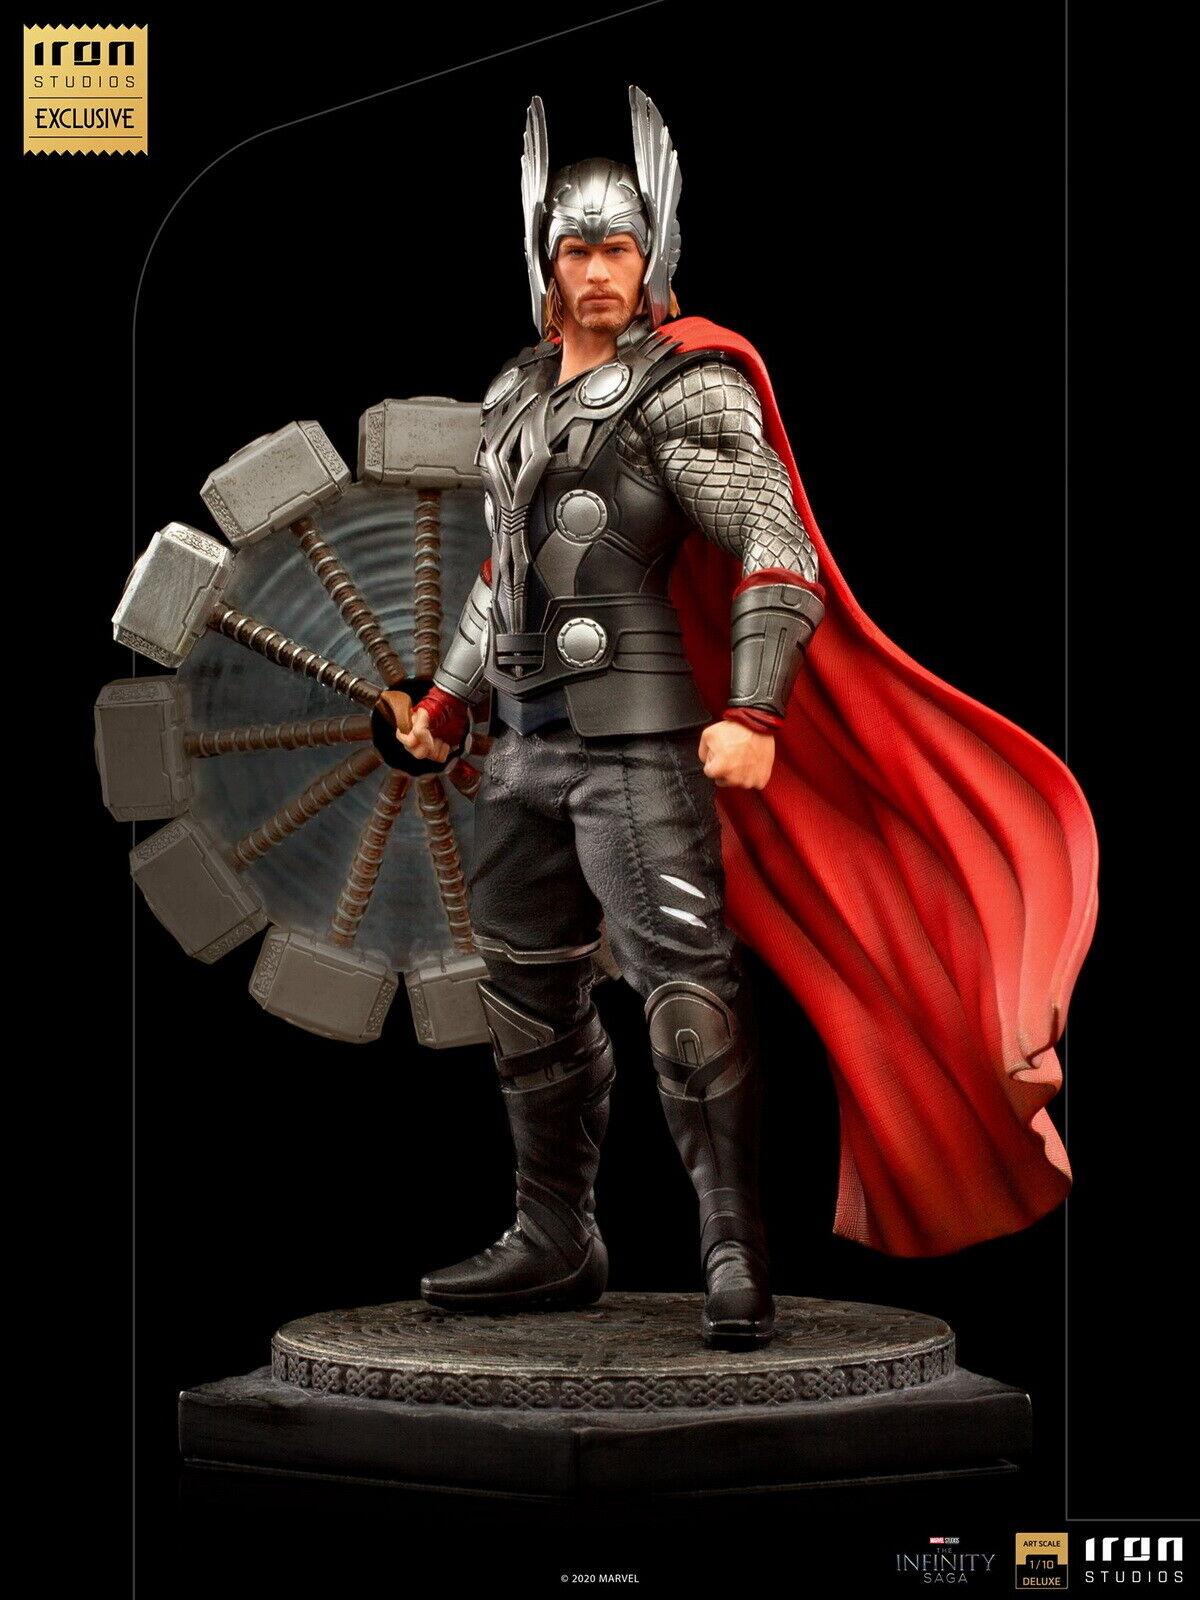 Iron Studios Thor 1/10 Statue Model Figurine Figure Display 9in. Avengers Series on eBay thumbnail